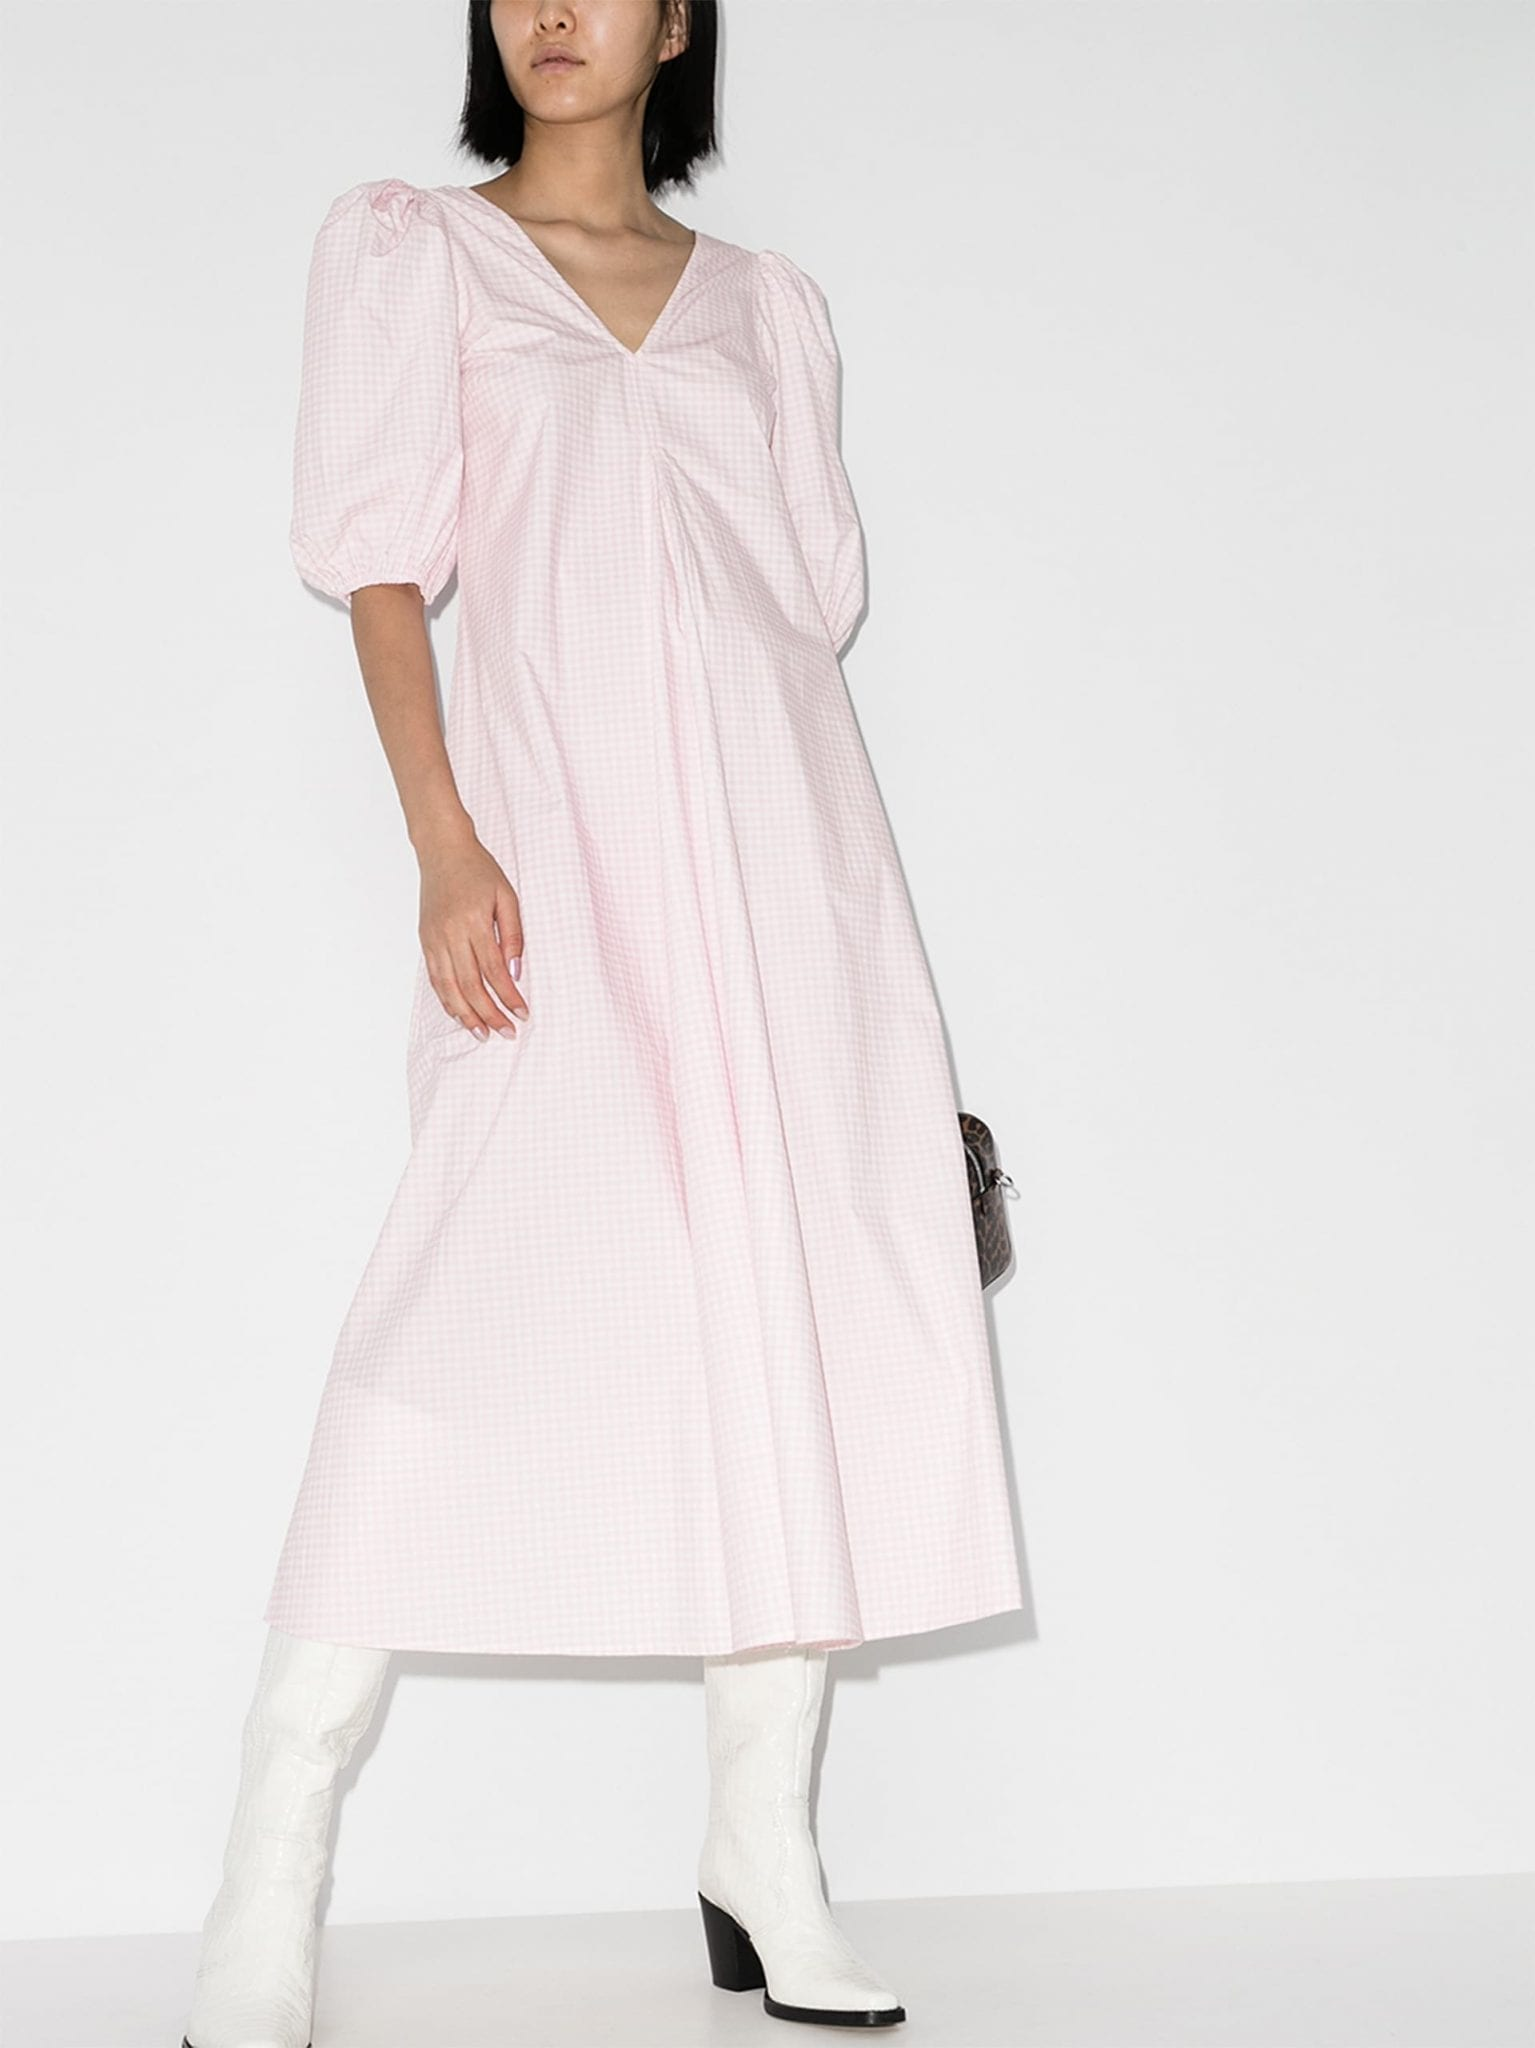 GANNI Gingham Midi Dress